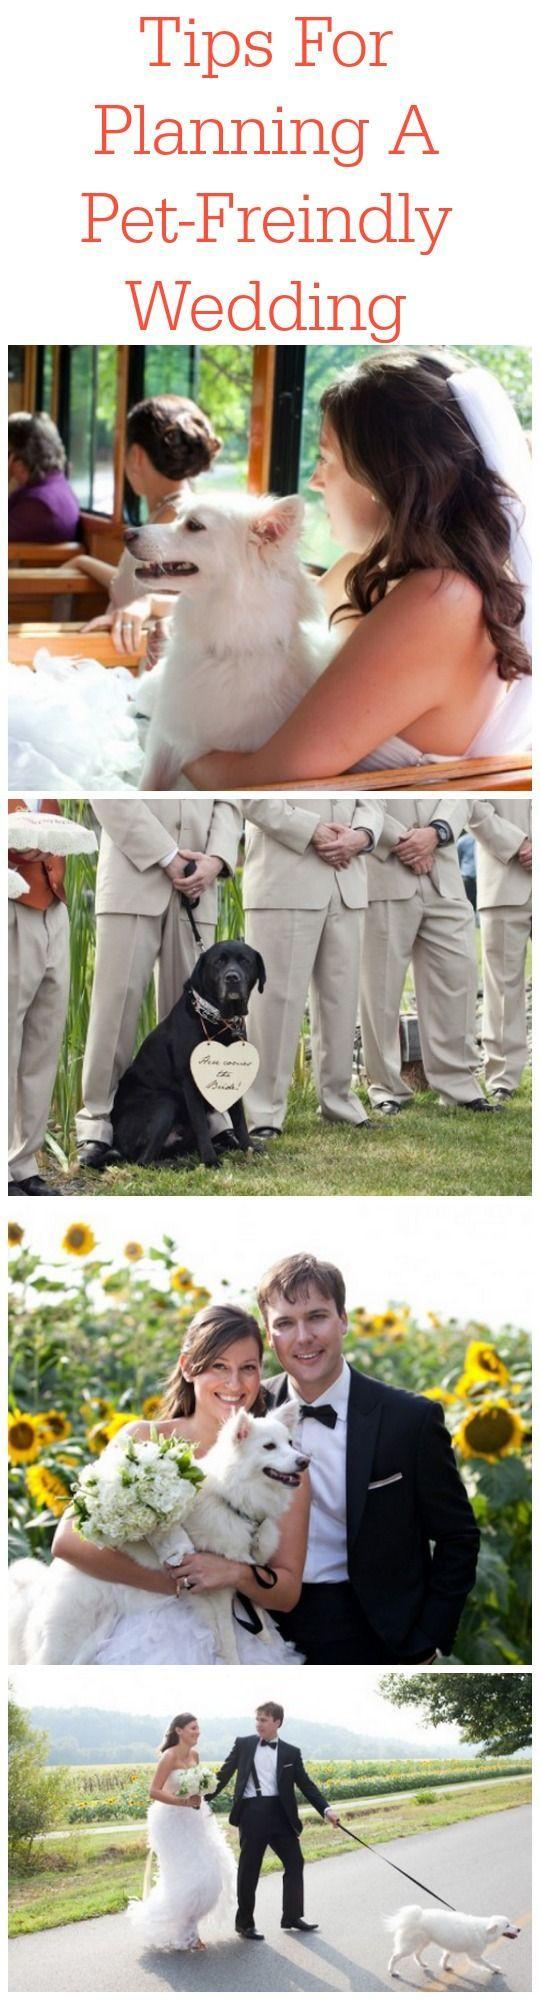 Wedding Dog Ideas @bestbrilliance